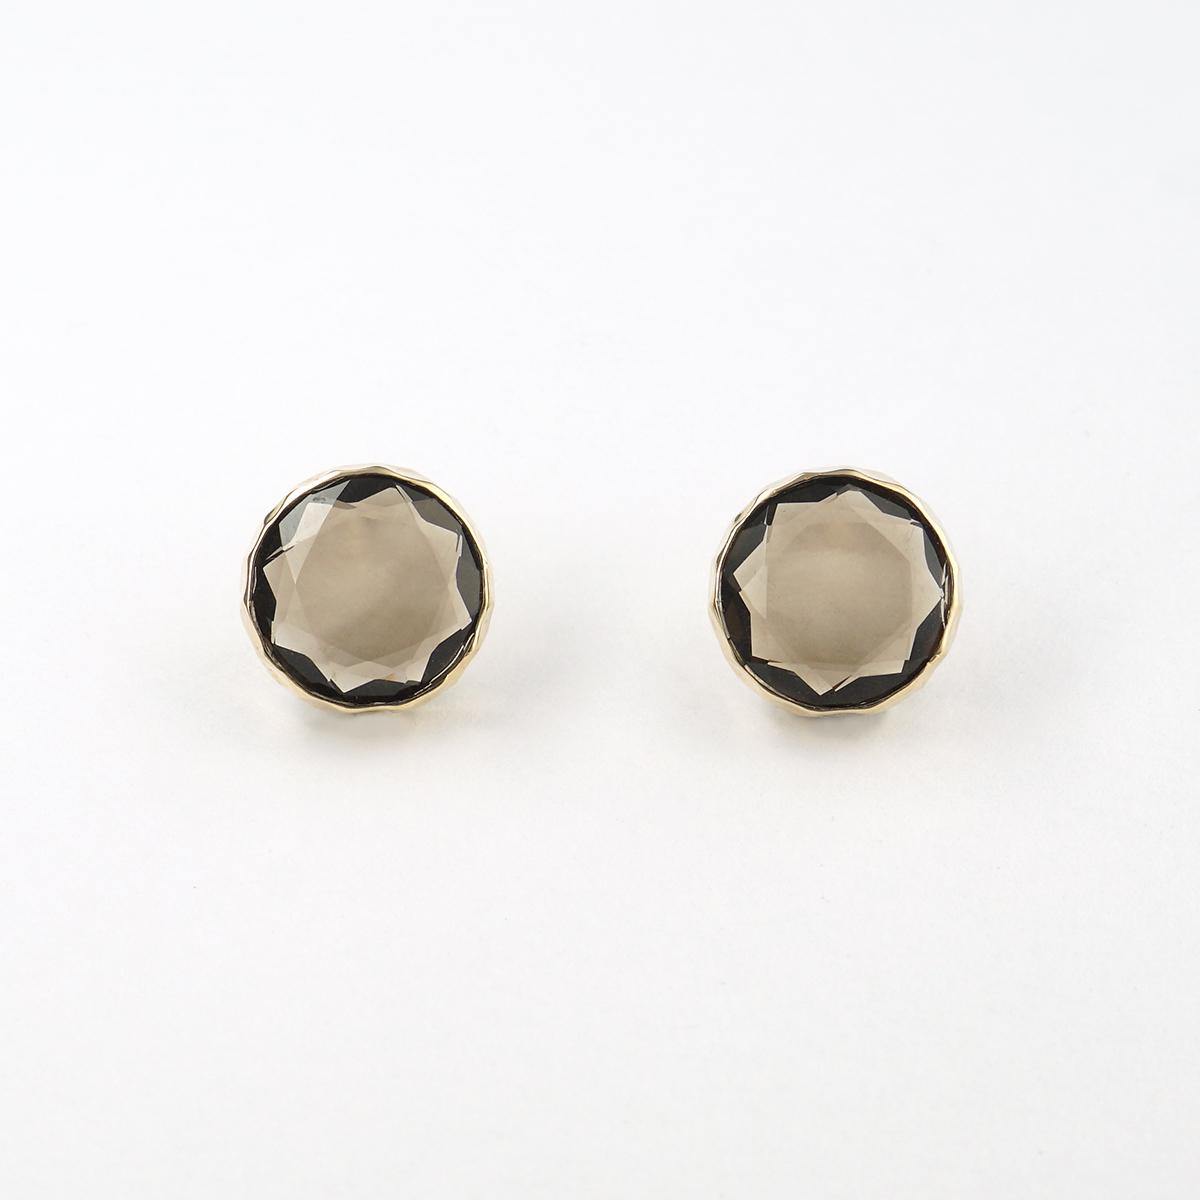 Marbles smoky quartz pierce